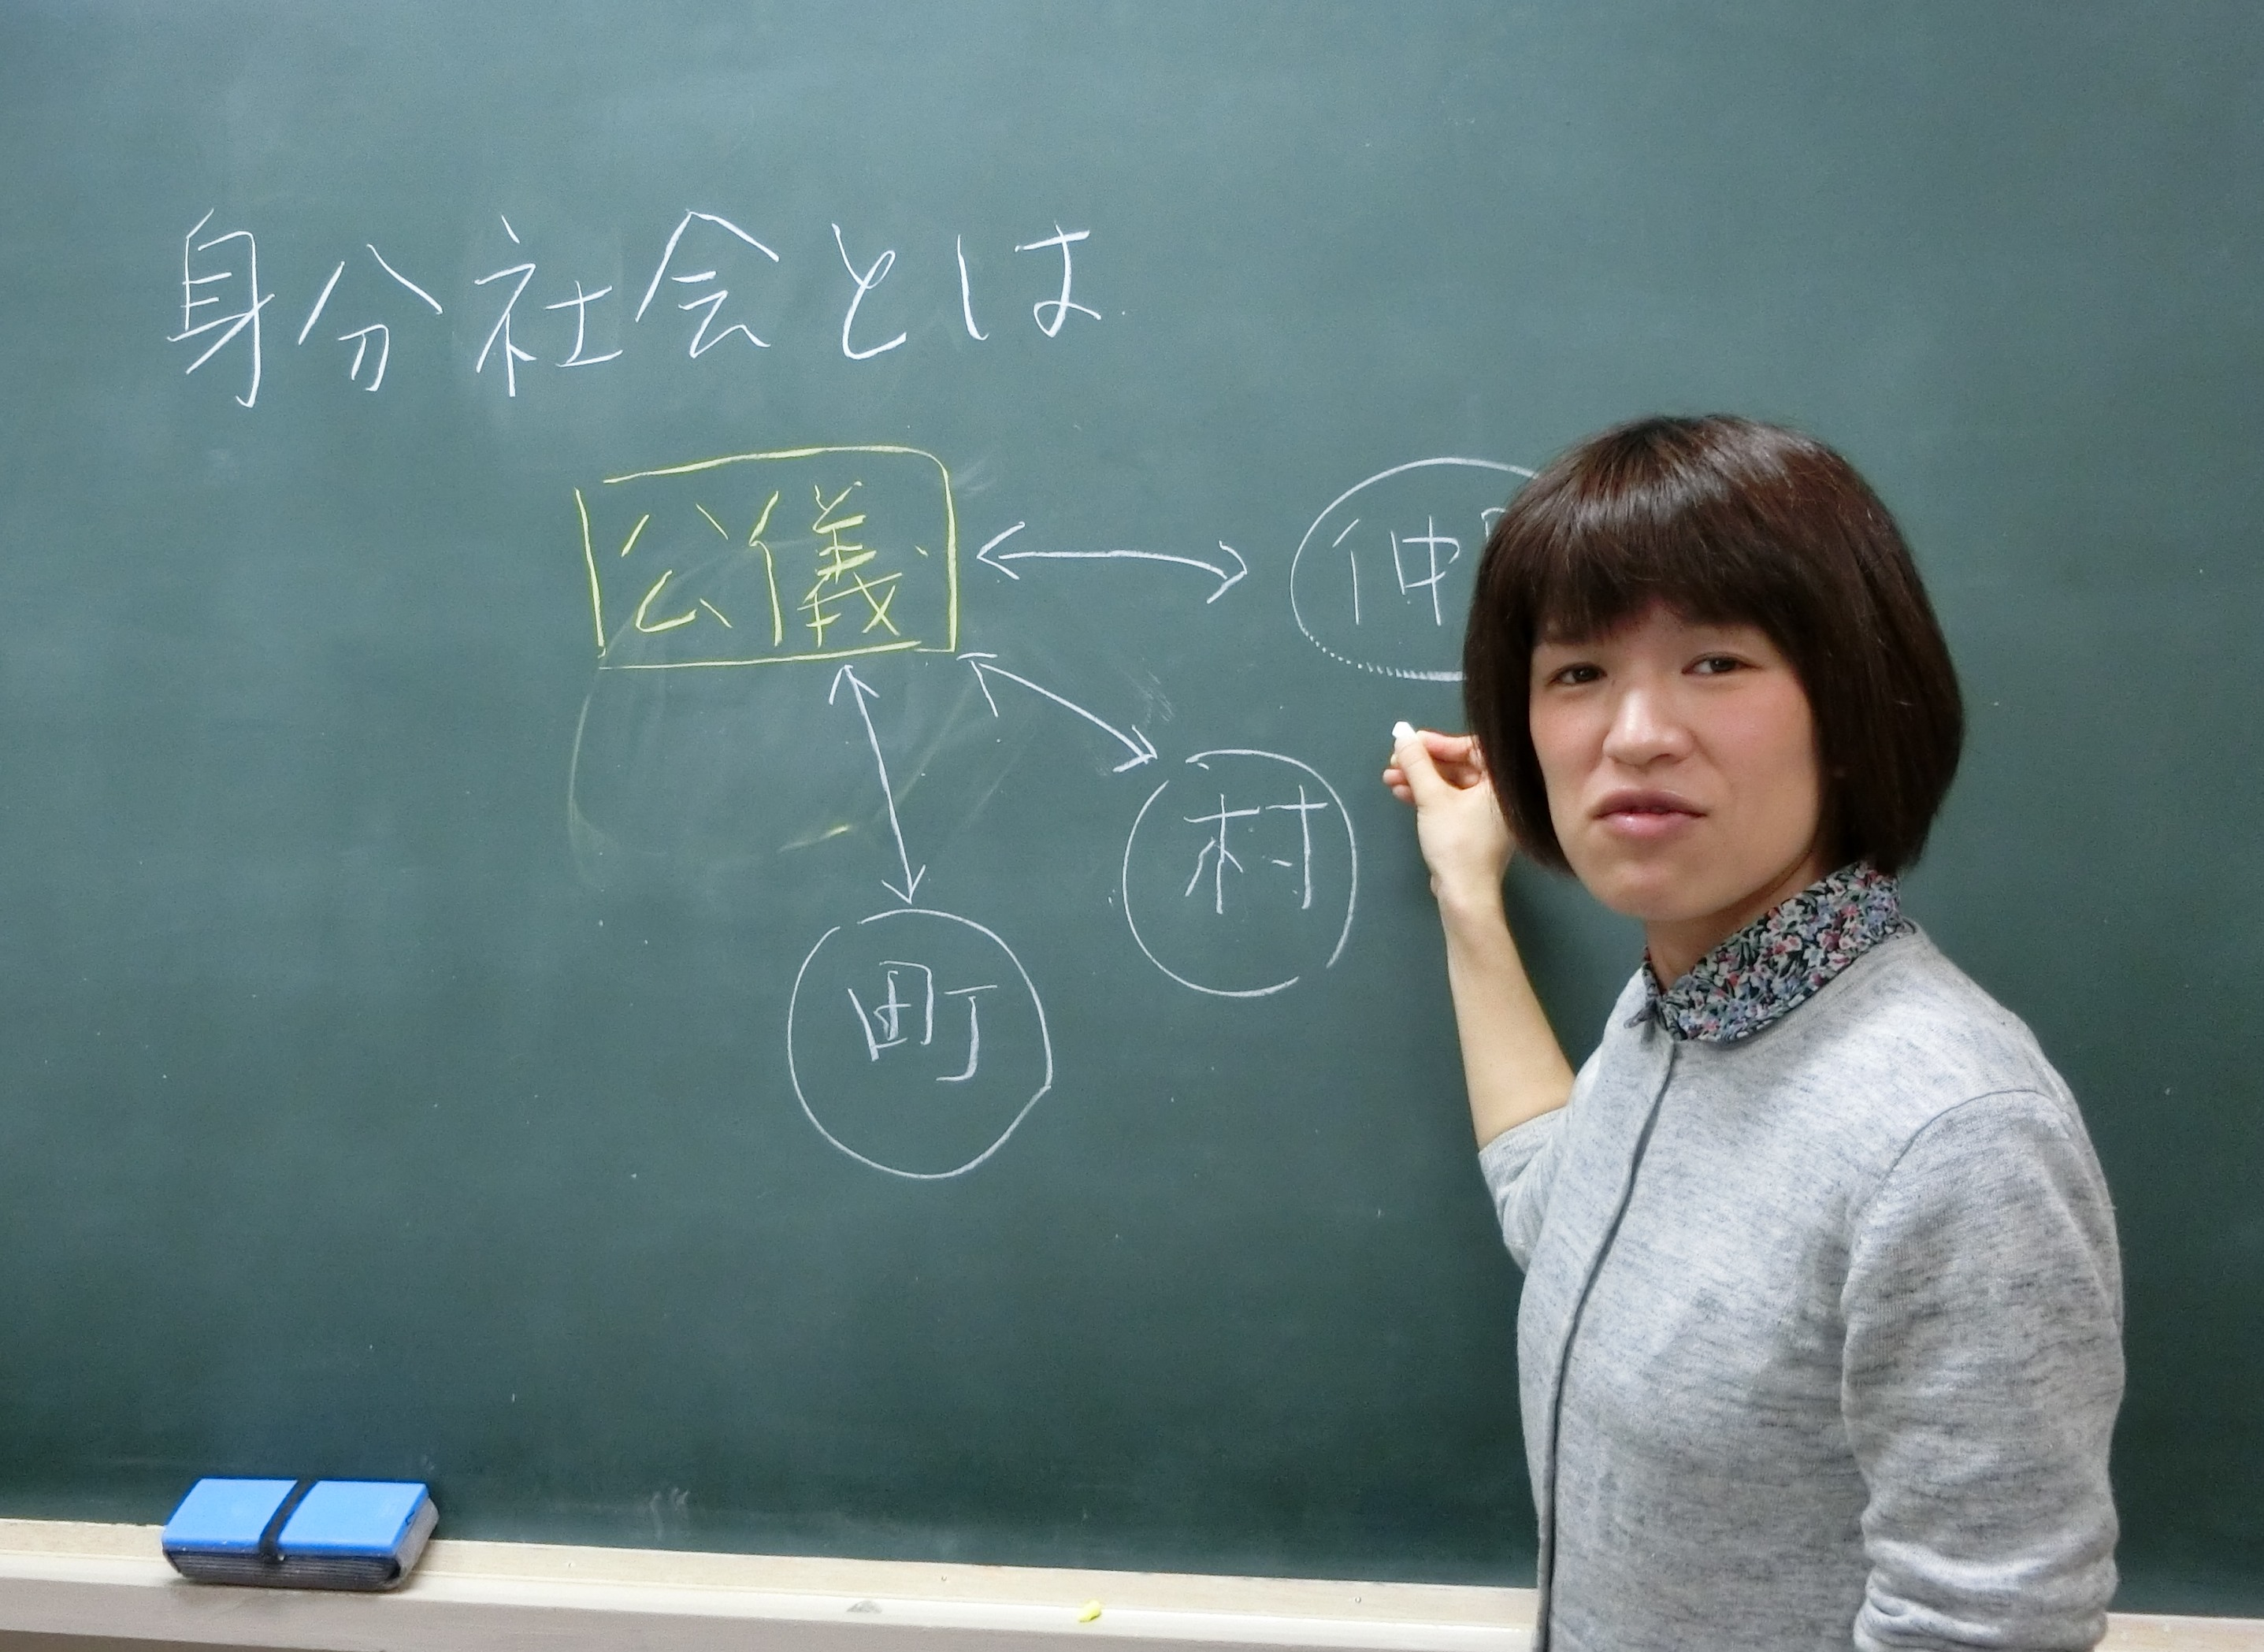 若手支援HP用写真(三田智子さん)